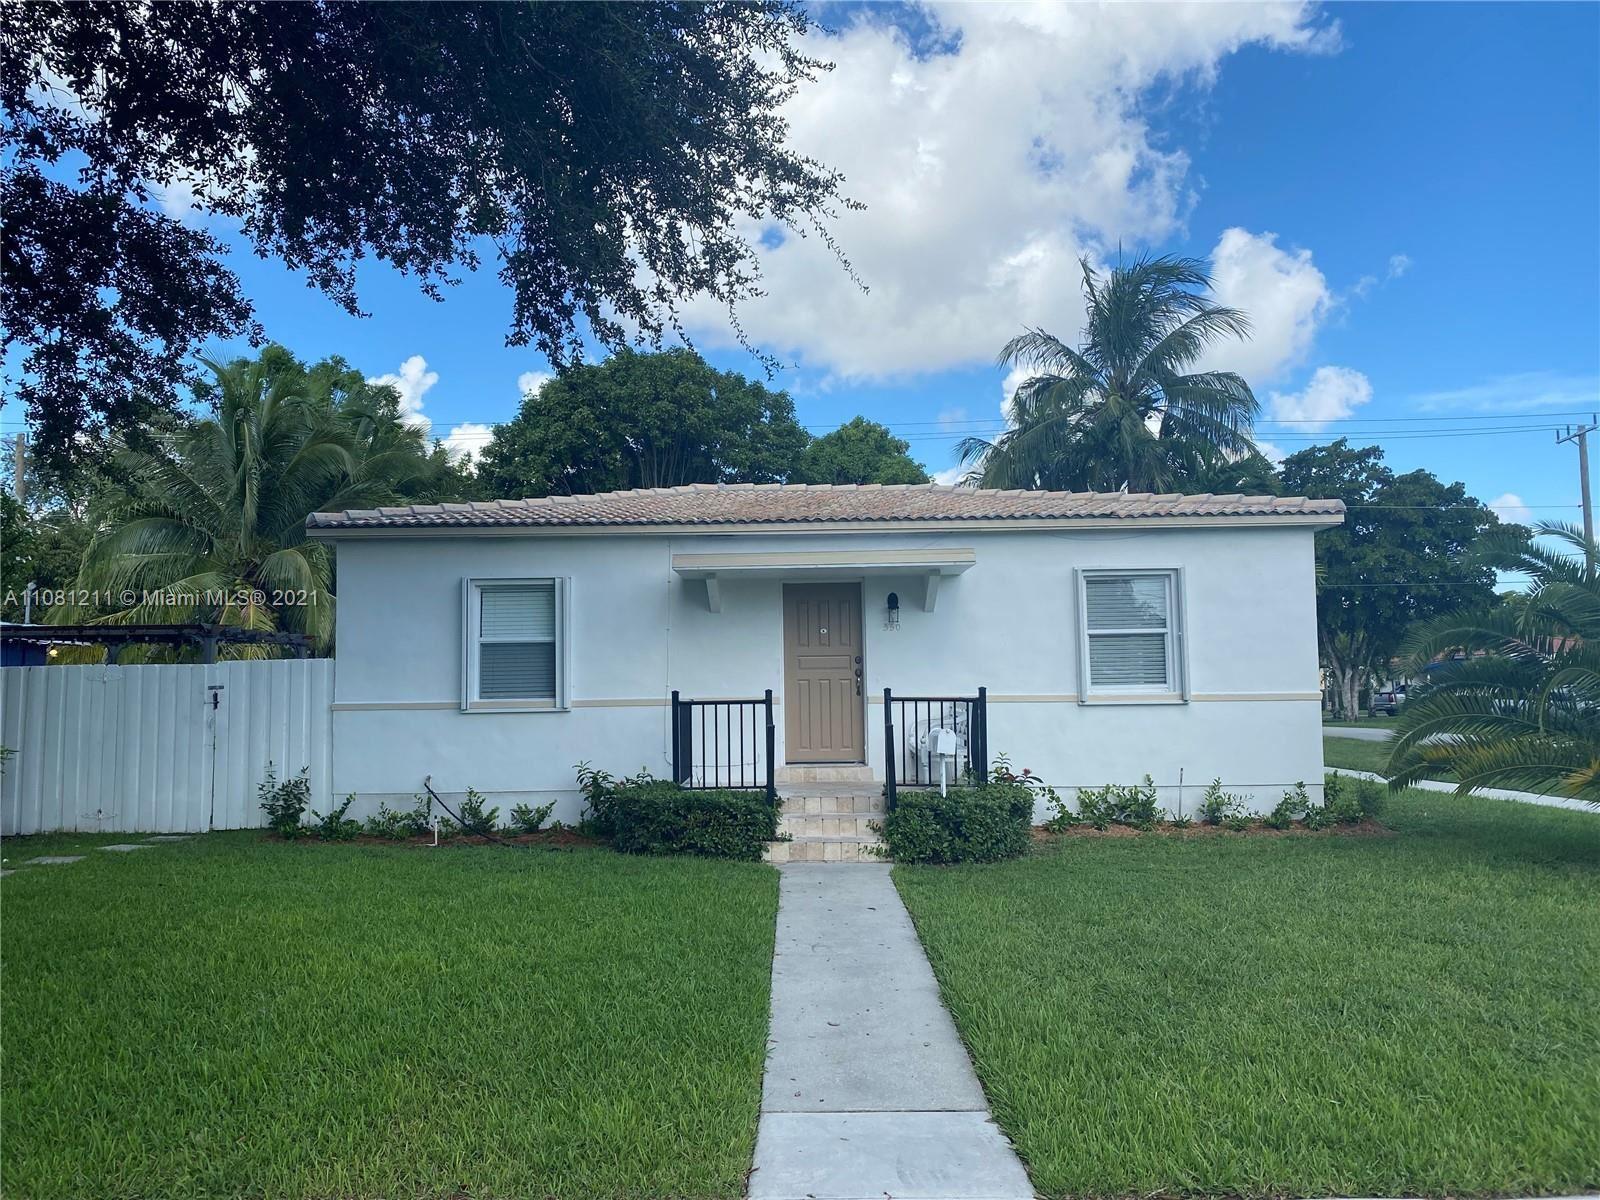 550 Cardinal St, Miami Springs, FL 33166 - #: A11081211